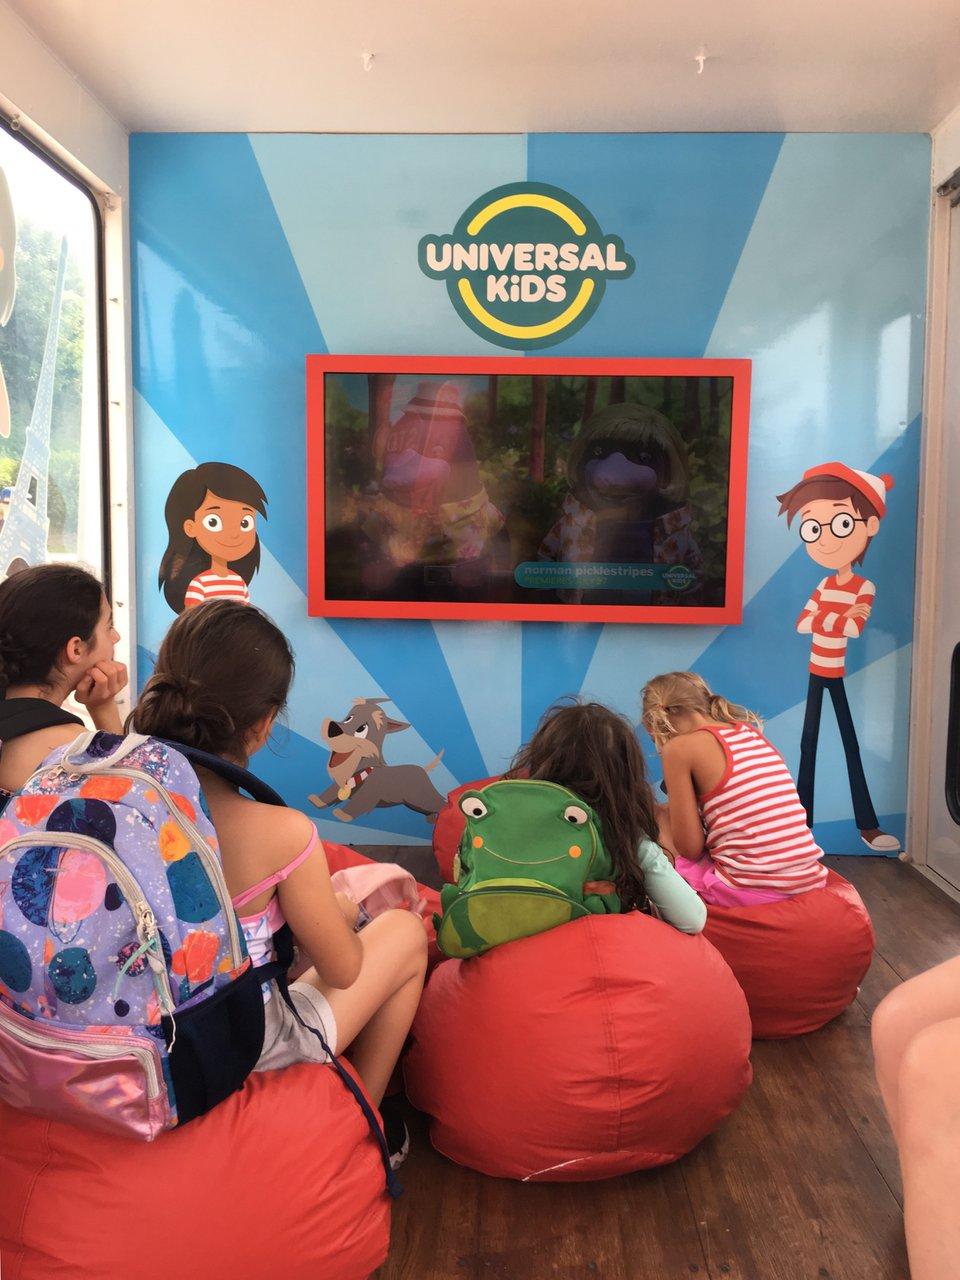 Universal Kids: Wanding Waldo Tour photo Photo Jun 29, 9 14 48 AM.jpg